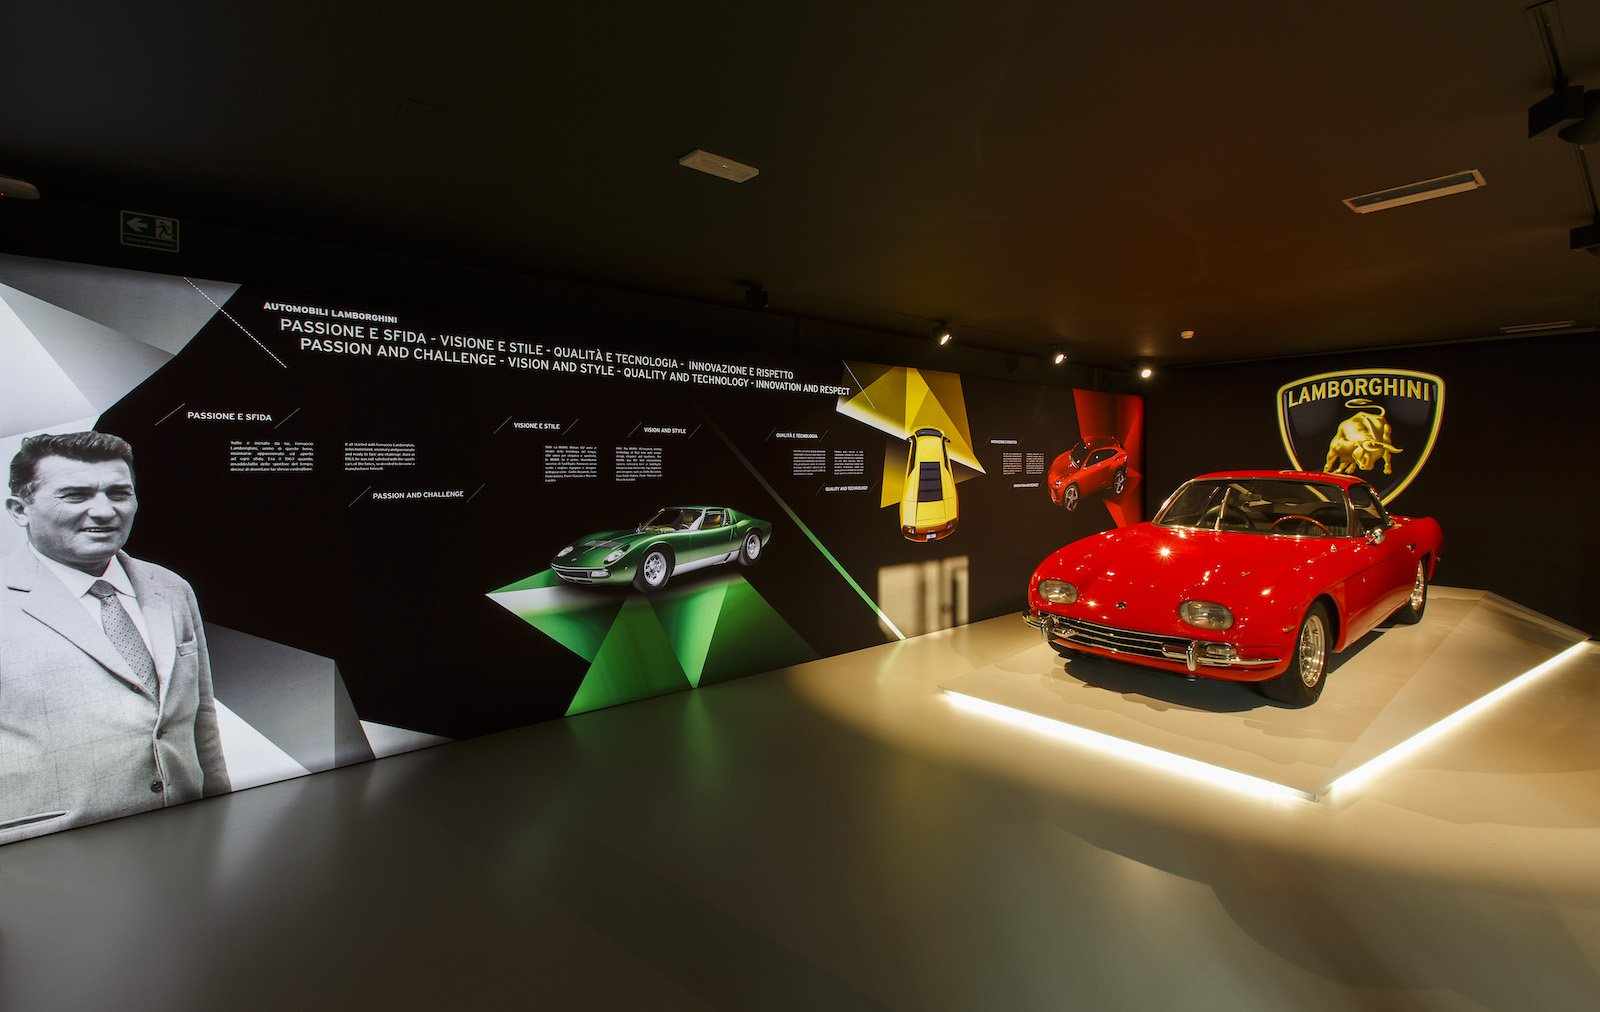 Lamborghini-Museum-Renovation-Miuras-3